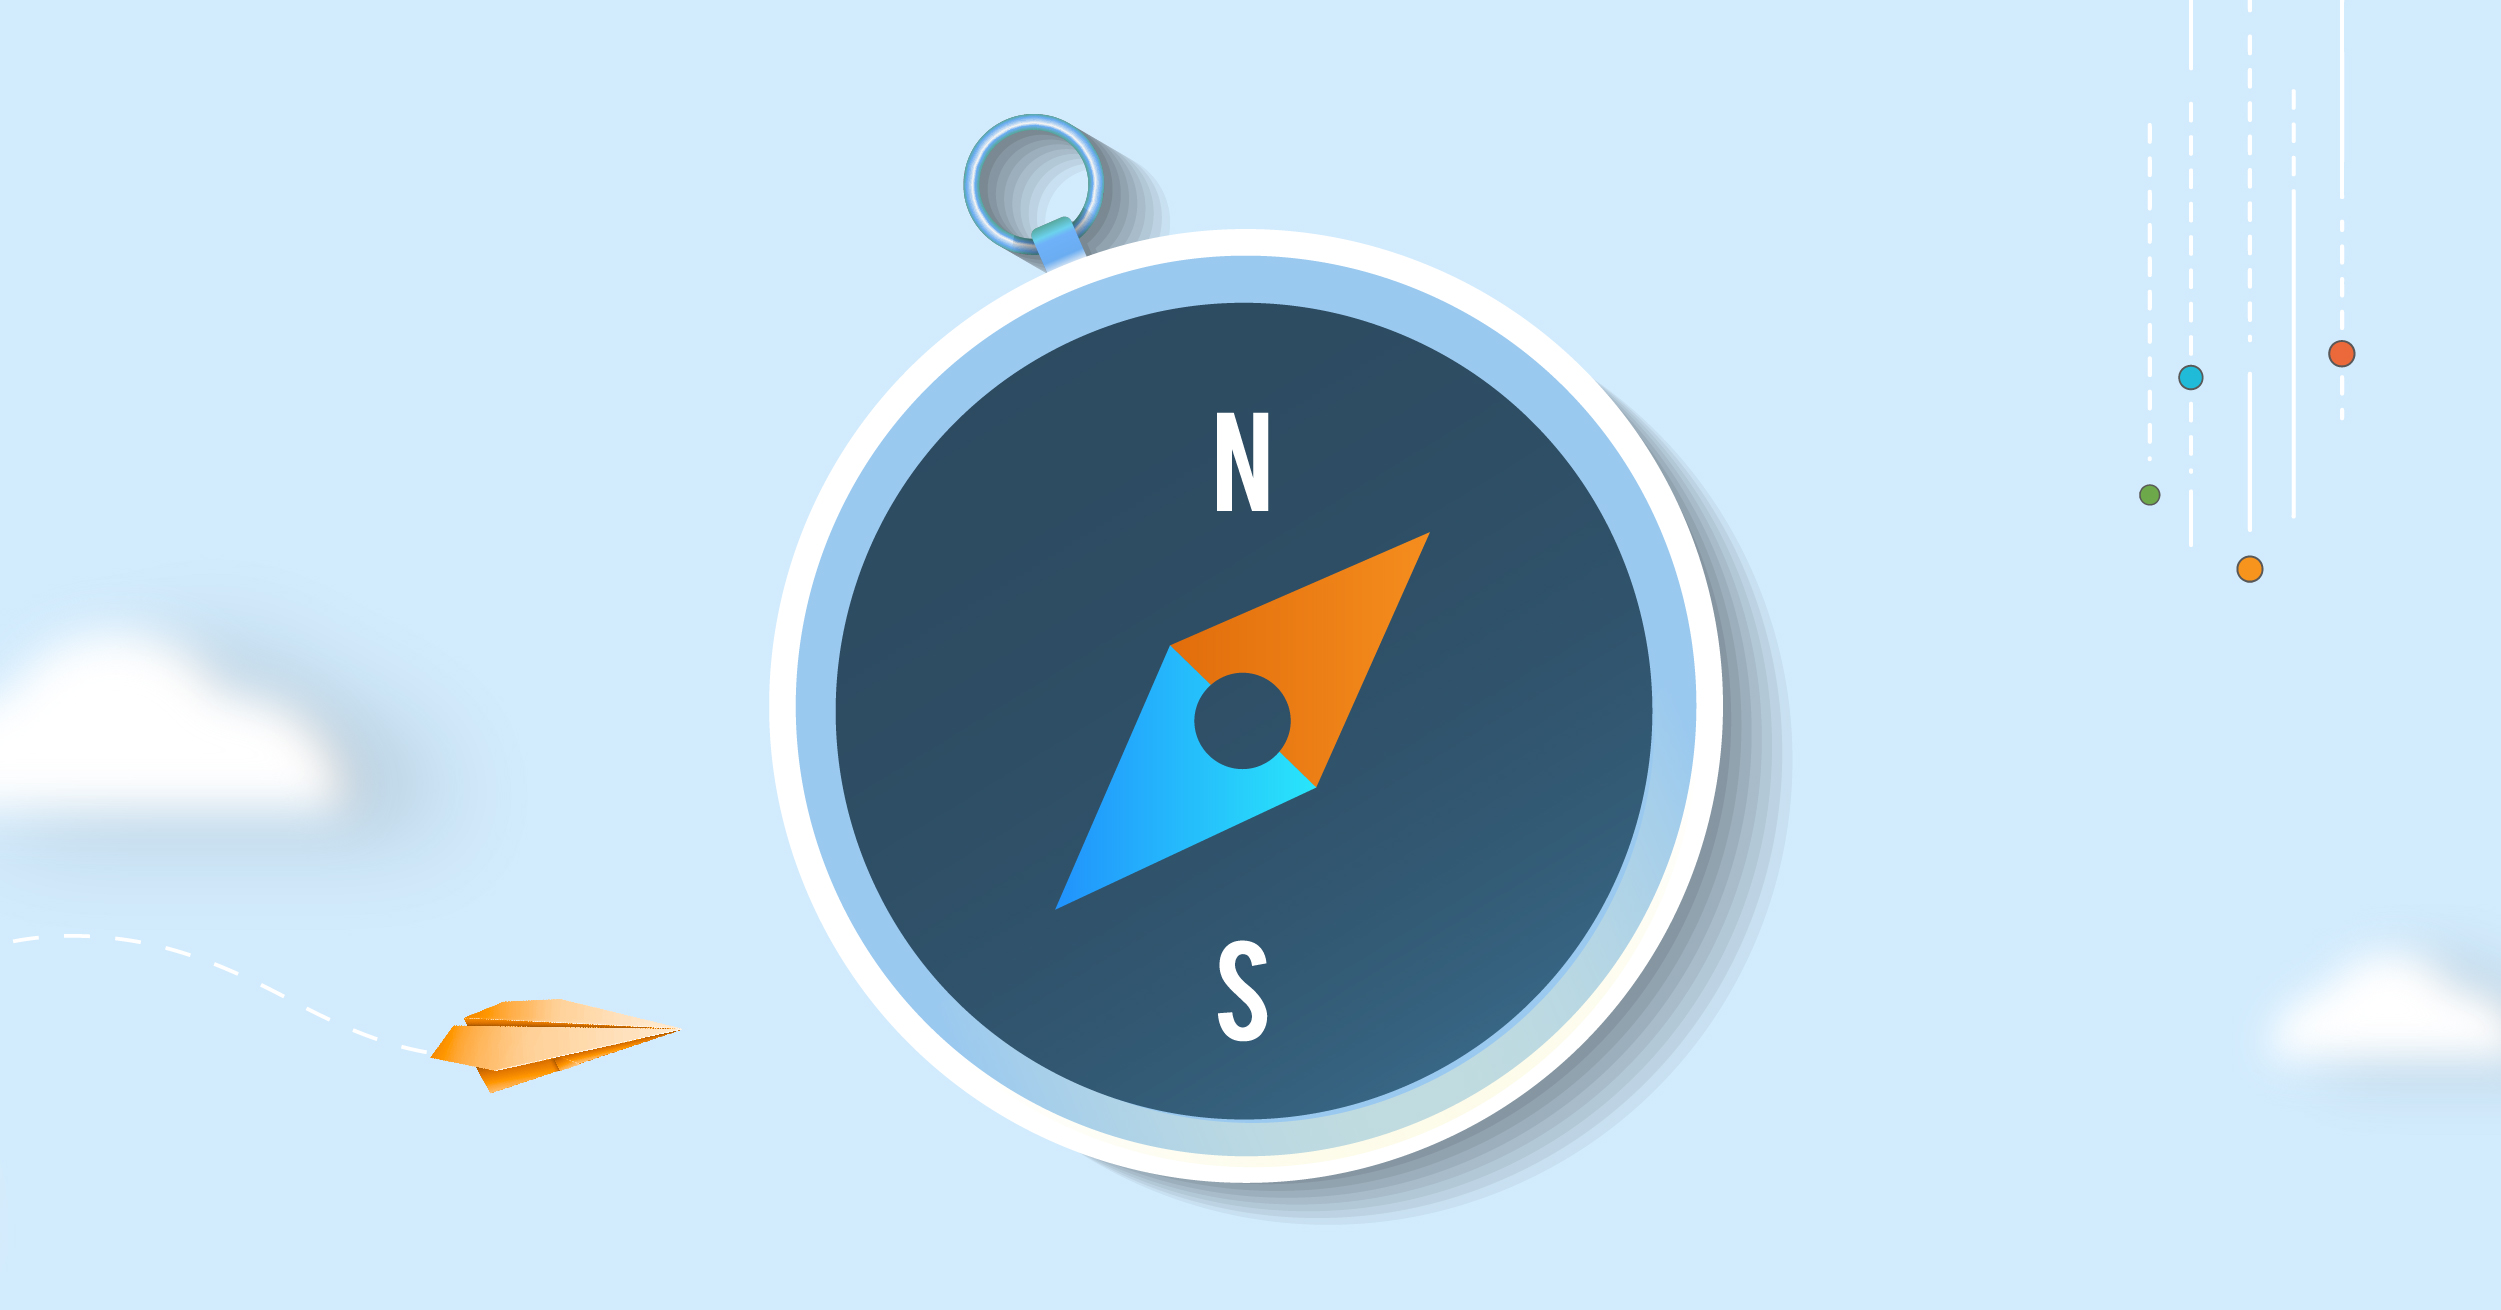 A digital marketing strategy framework functions as a compass